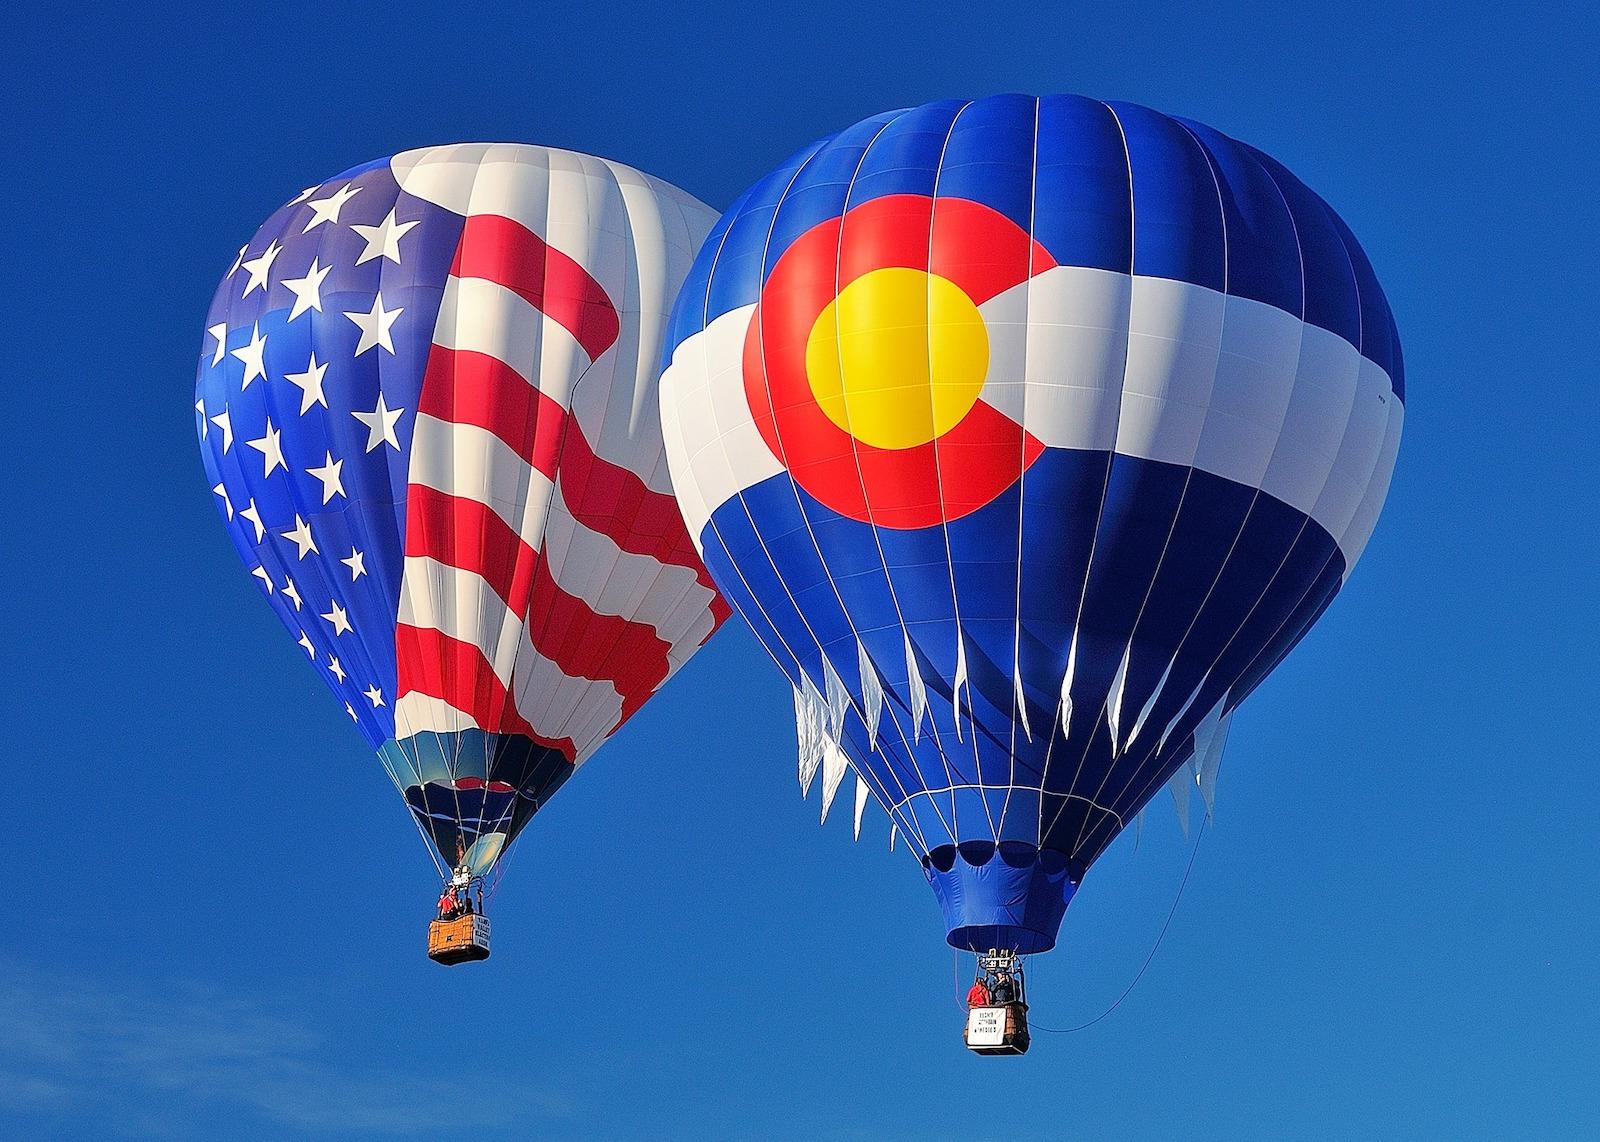 Gambar bendera Amerika dan balon udara panas bendera Colorado di Steamboat Springs Hot Air Balloon Rodeo